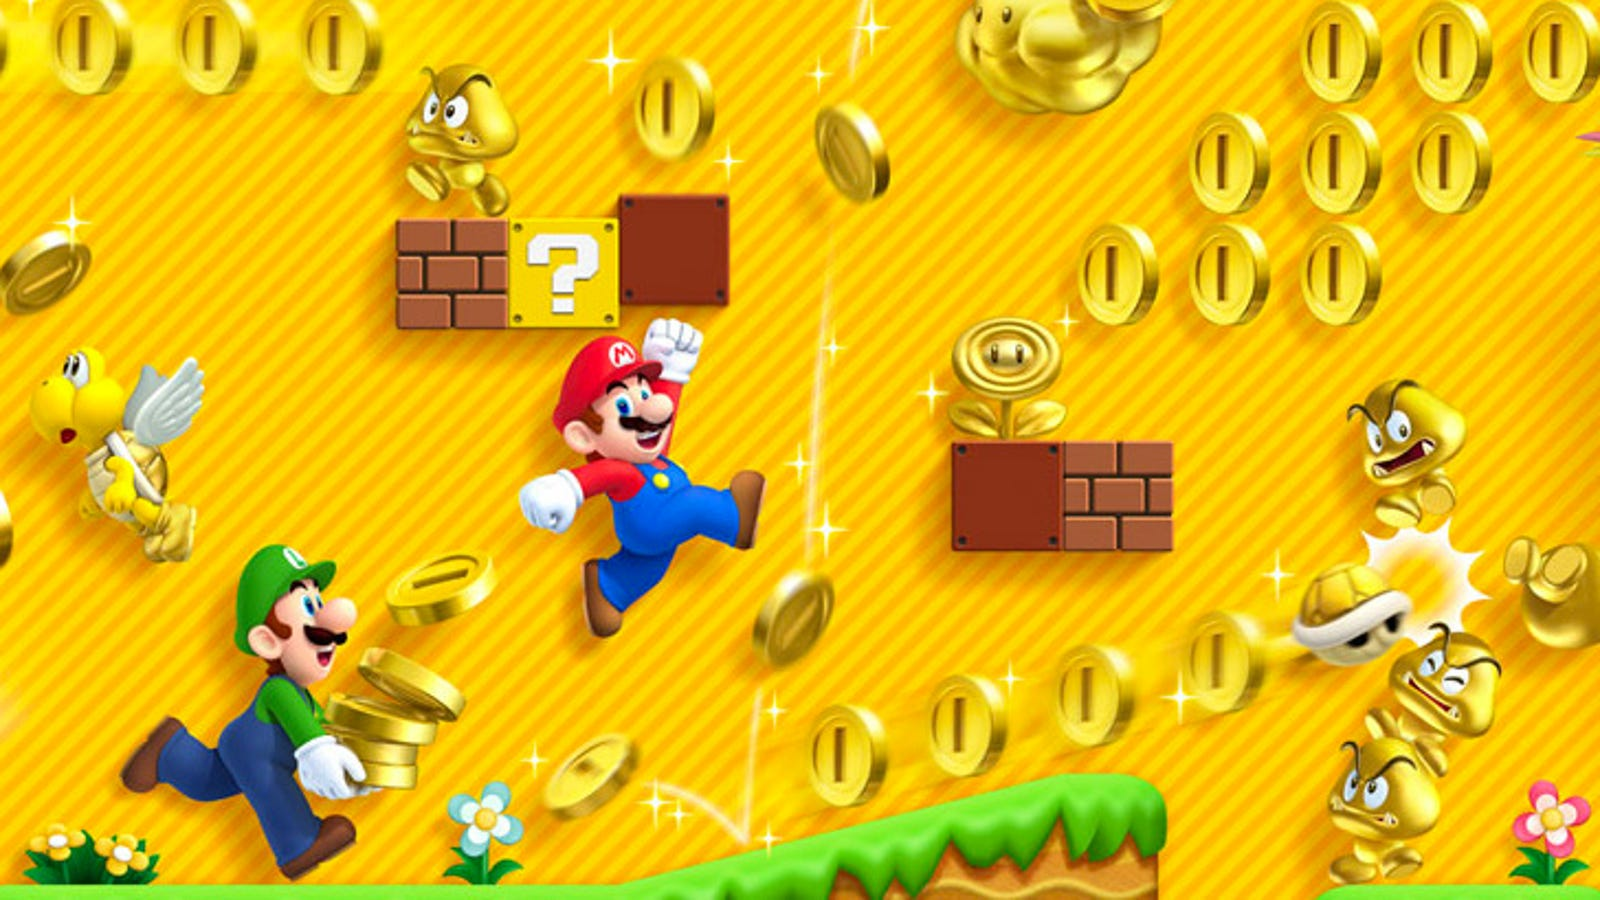 New Super Mario Bros 2 DLC and Real-World Pokémon Hunting